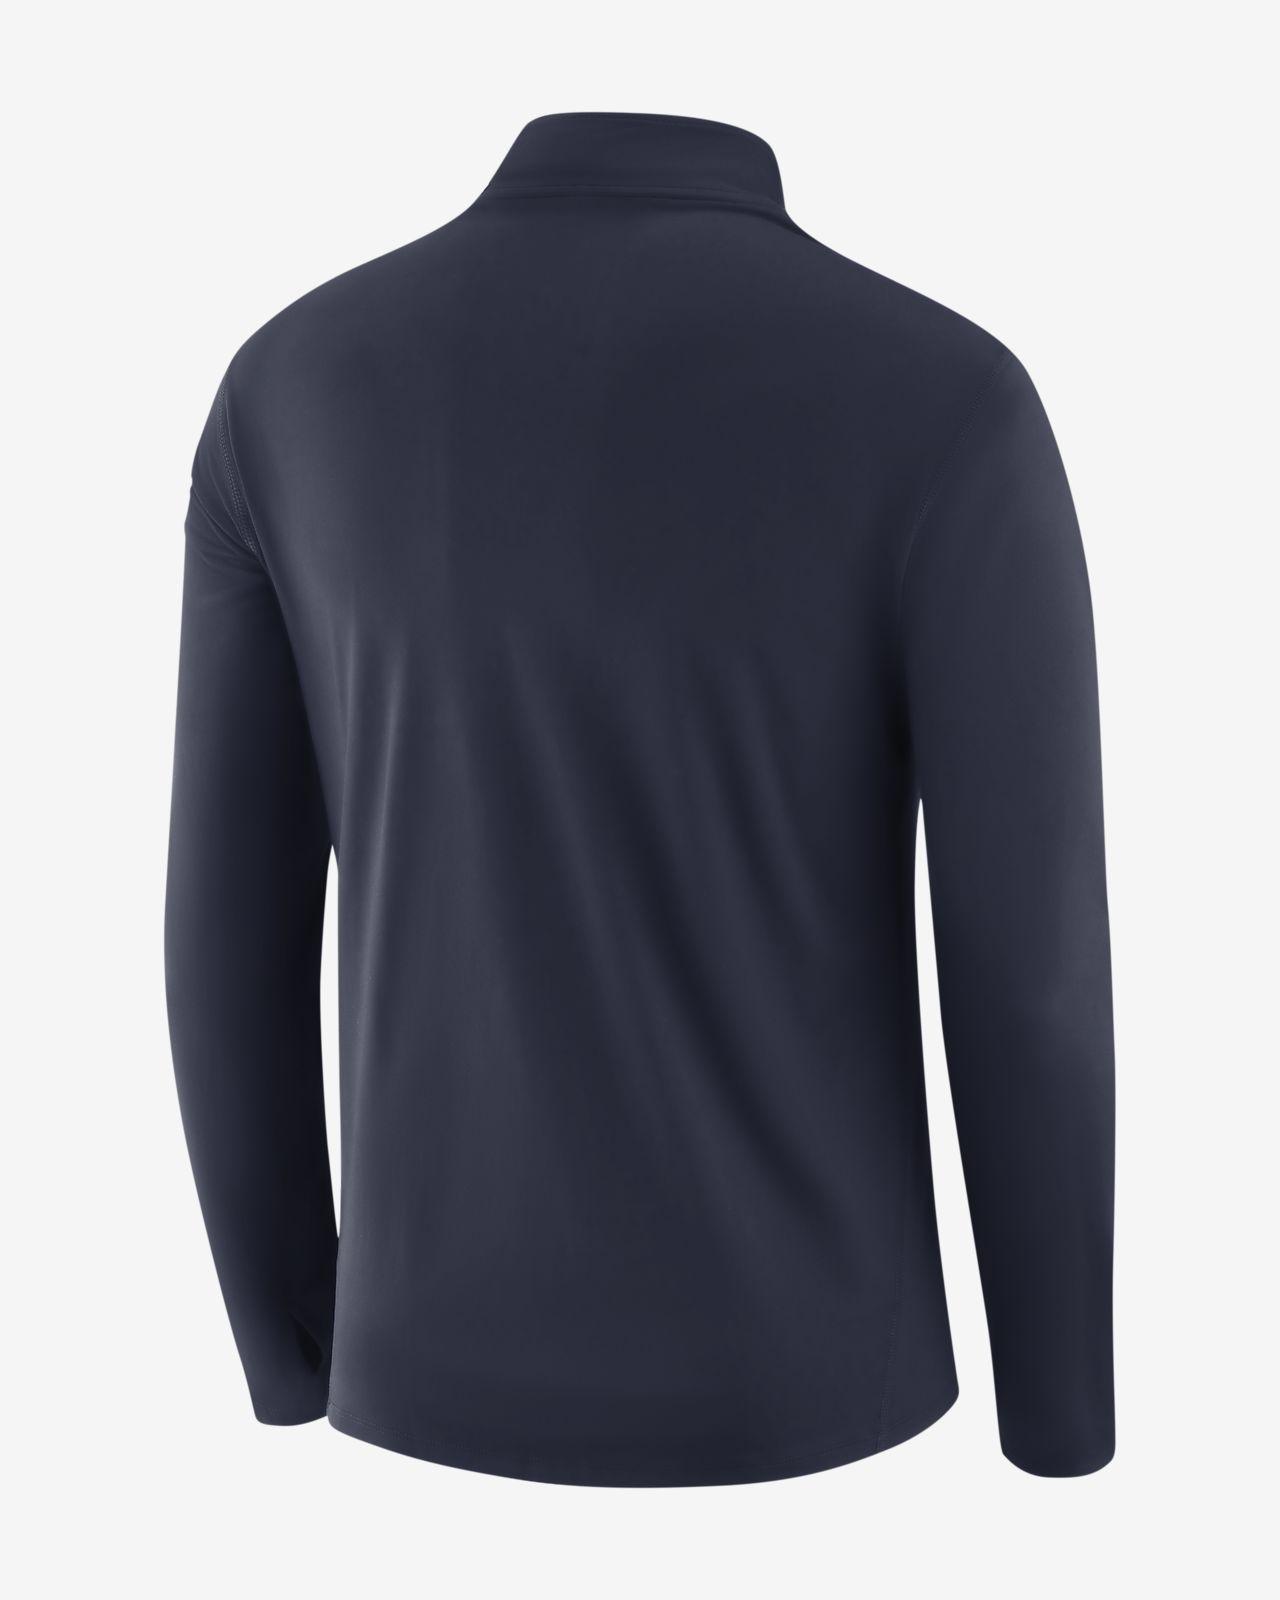 Brave Nike Running Dri Fit Mens Size 1x Long Sleeve Shirt Aqua Men's Clothing